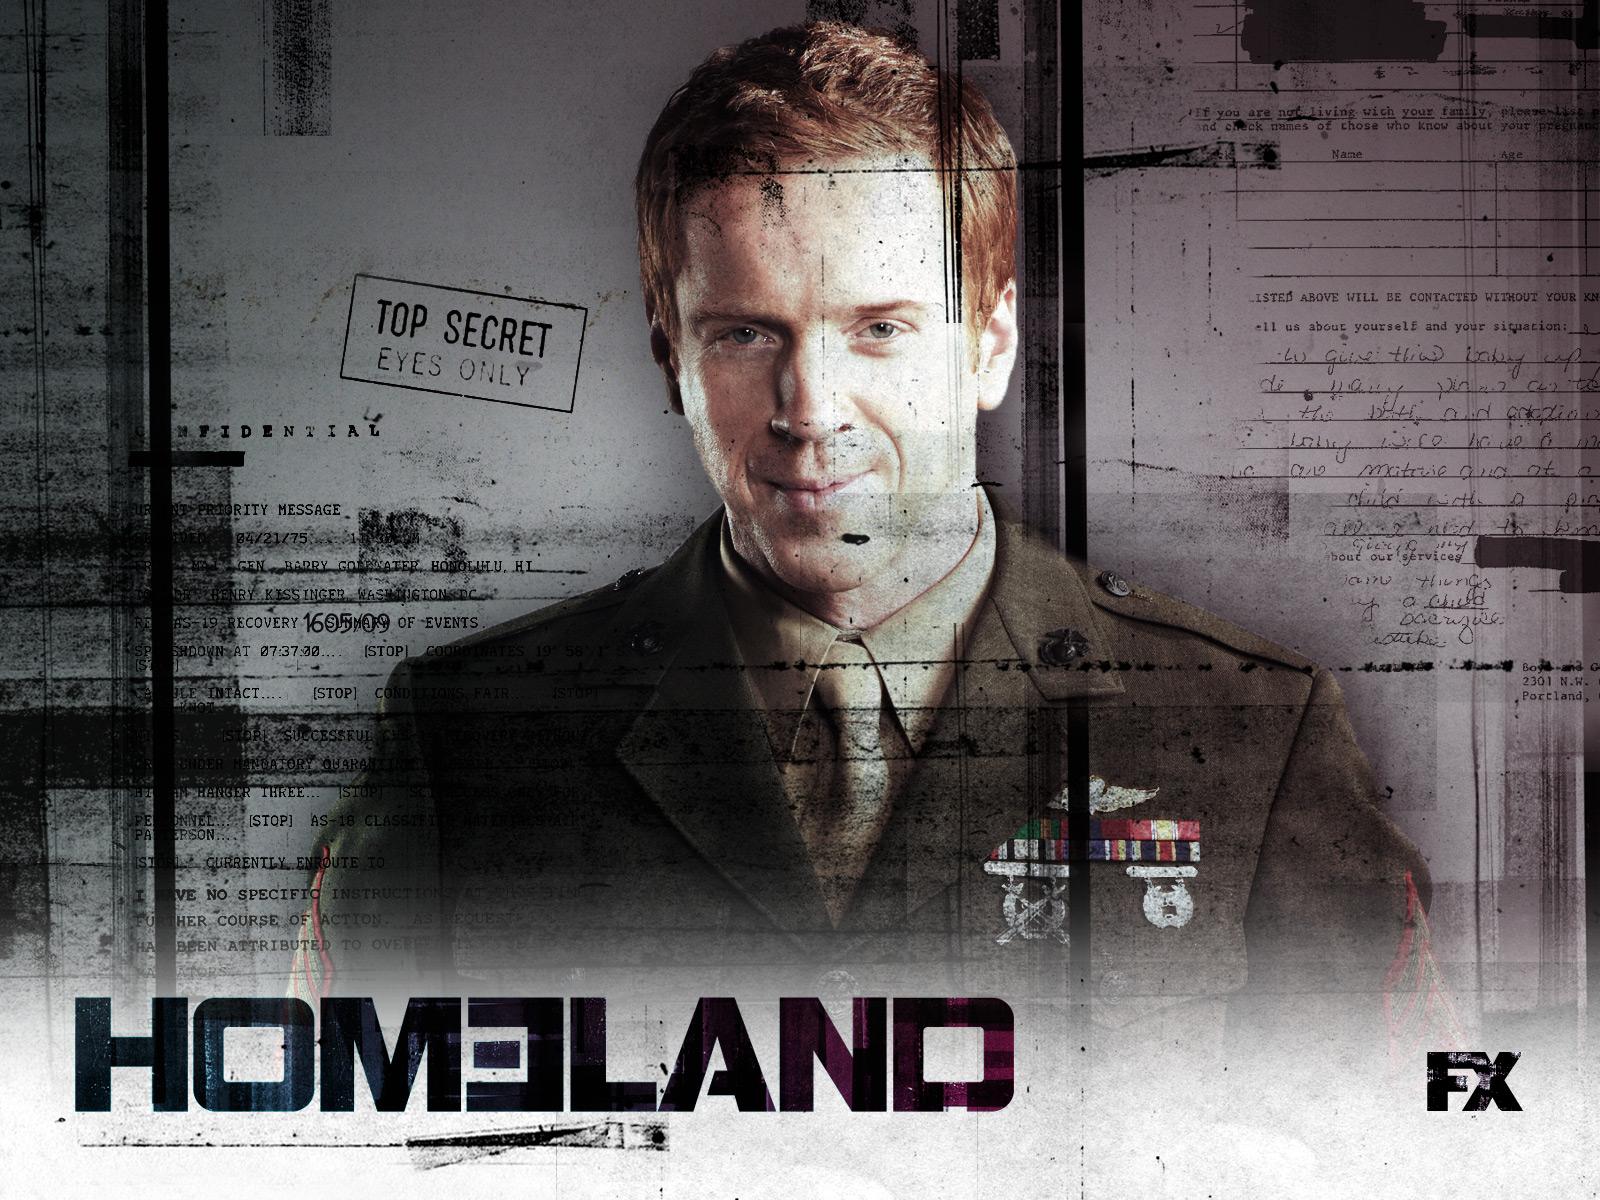 Homeland-homeland-30373170-1600-1200